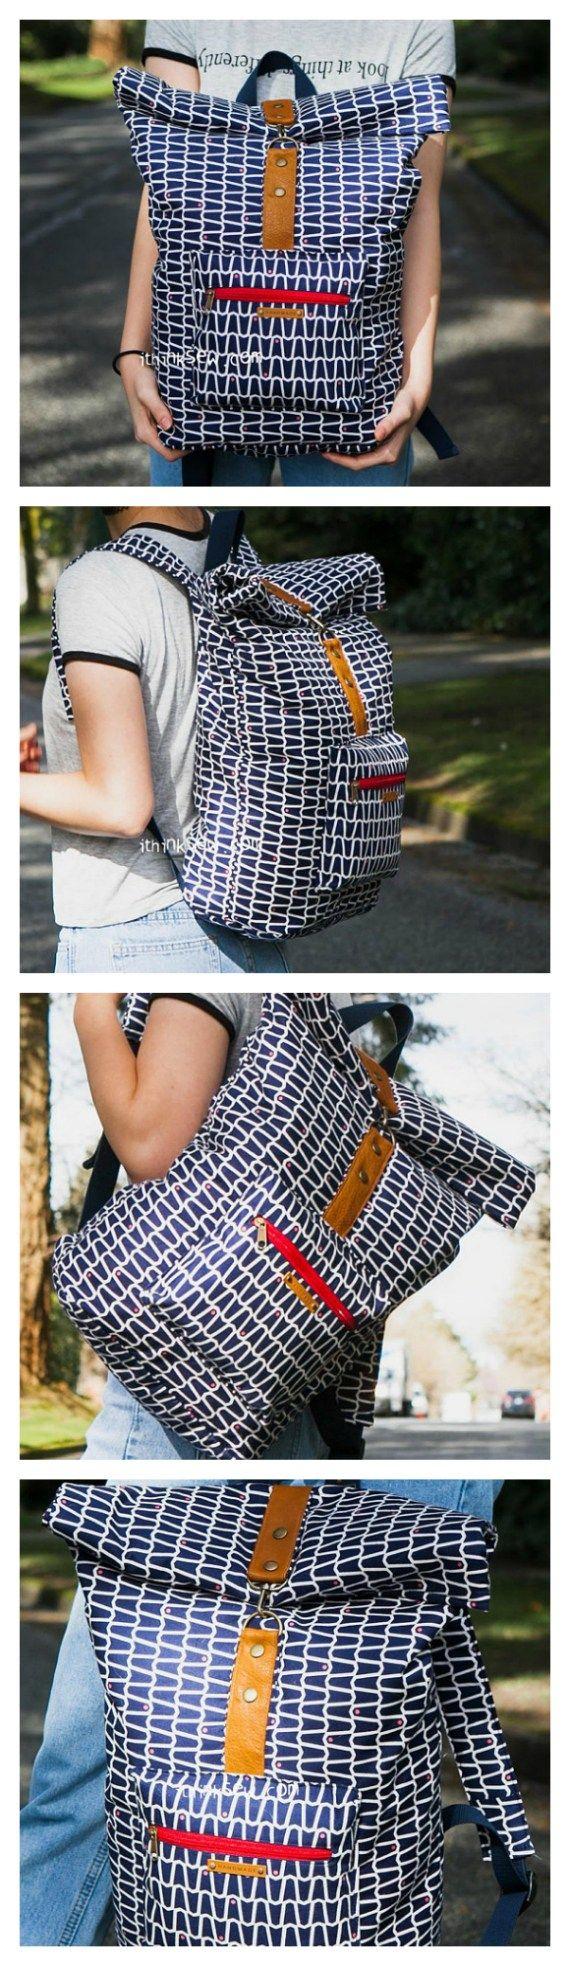 Roxanne Rolltop Backpack pdf pattern – Coser bolsos modernos